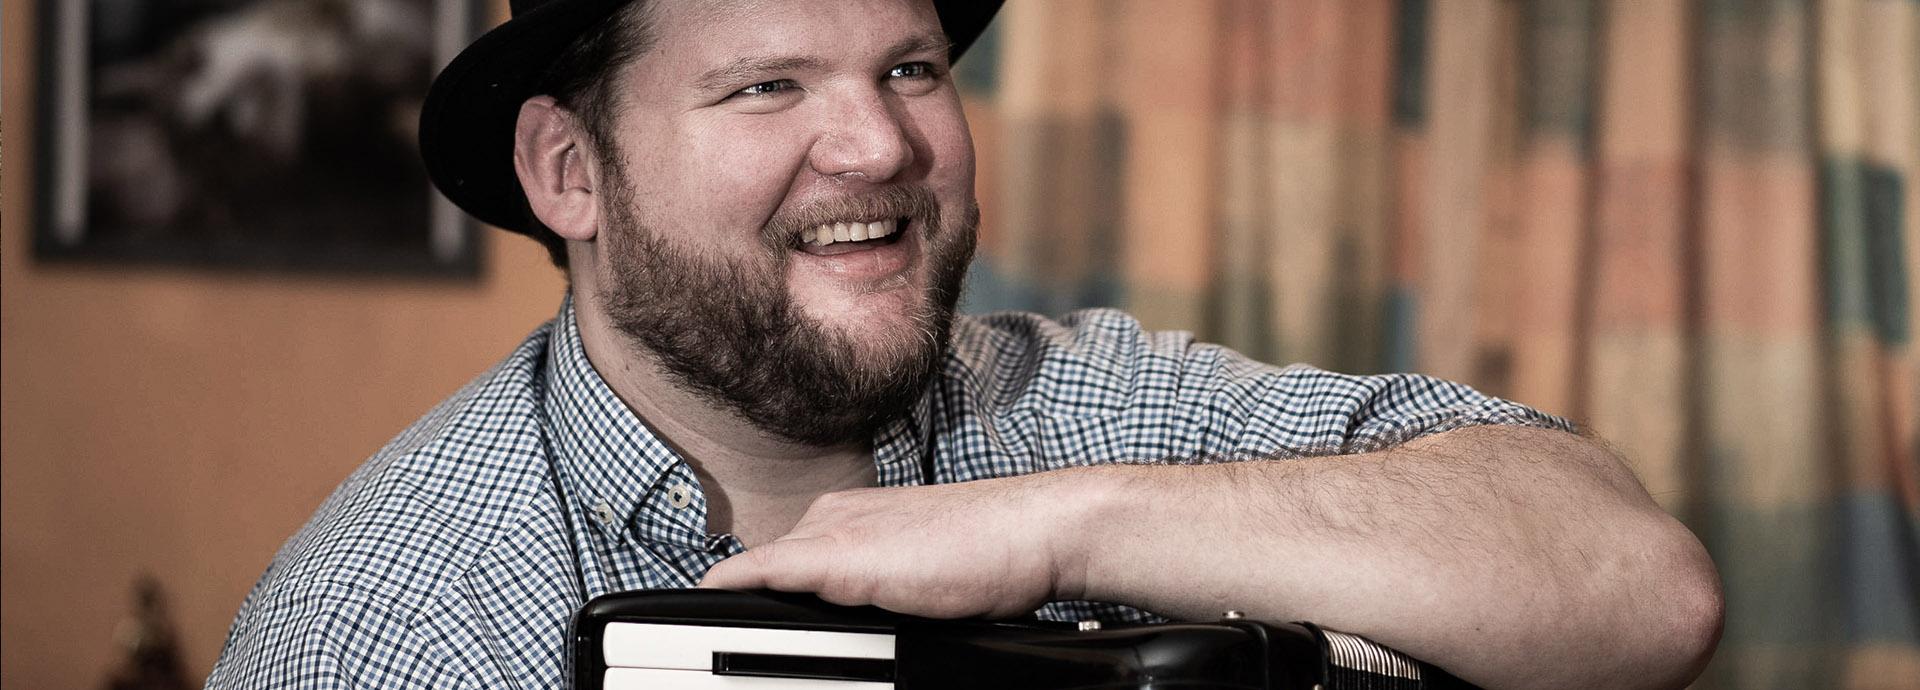 Elias Maier Portraitfotografie Musiker